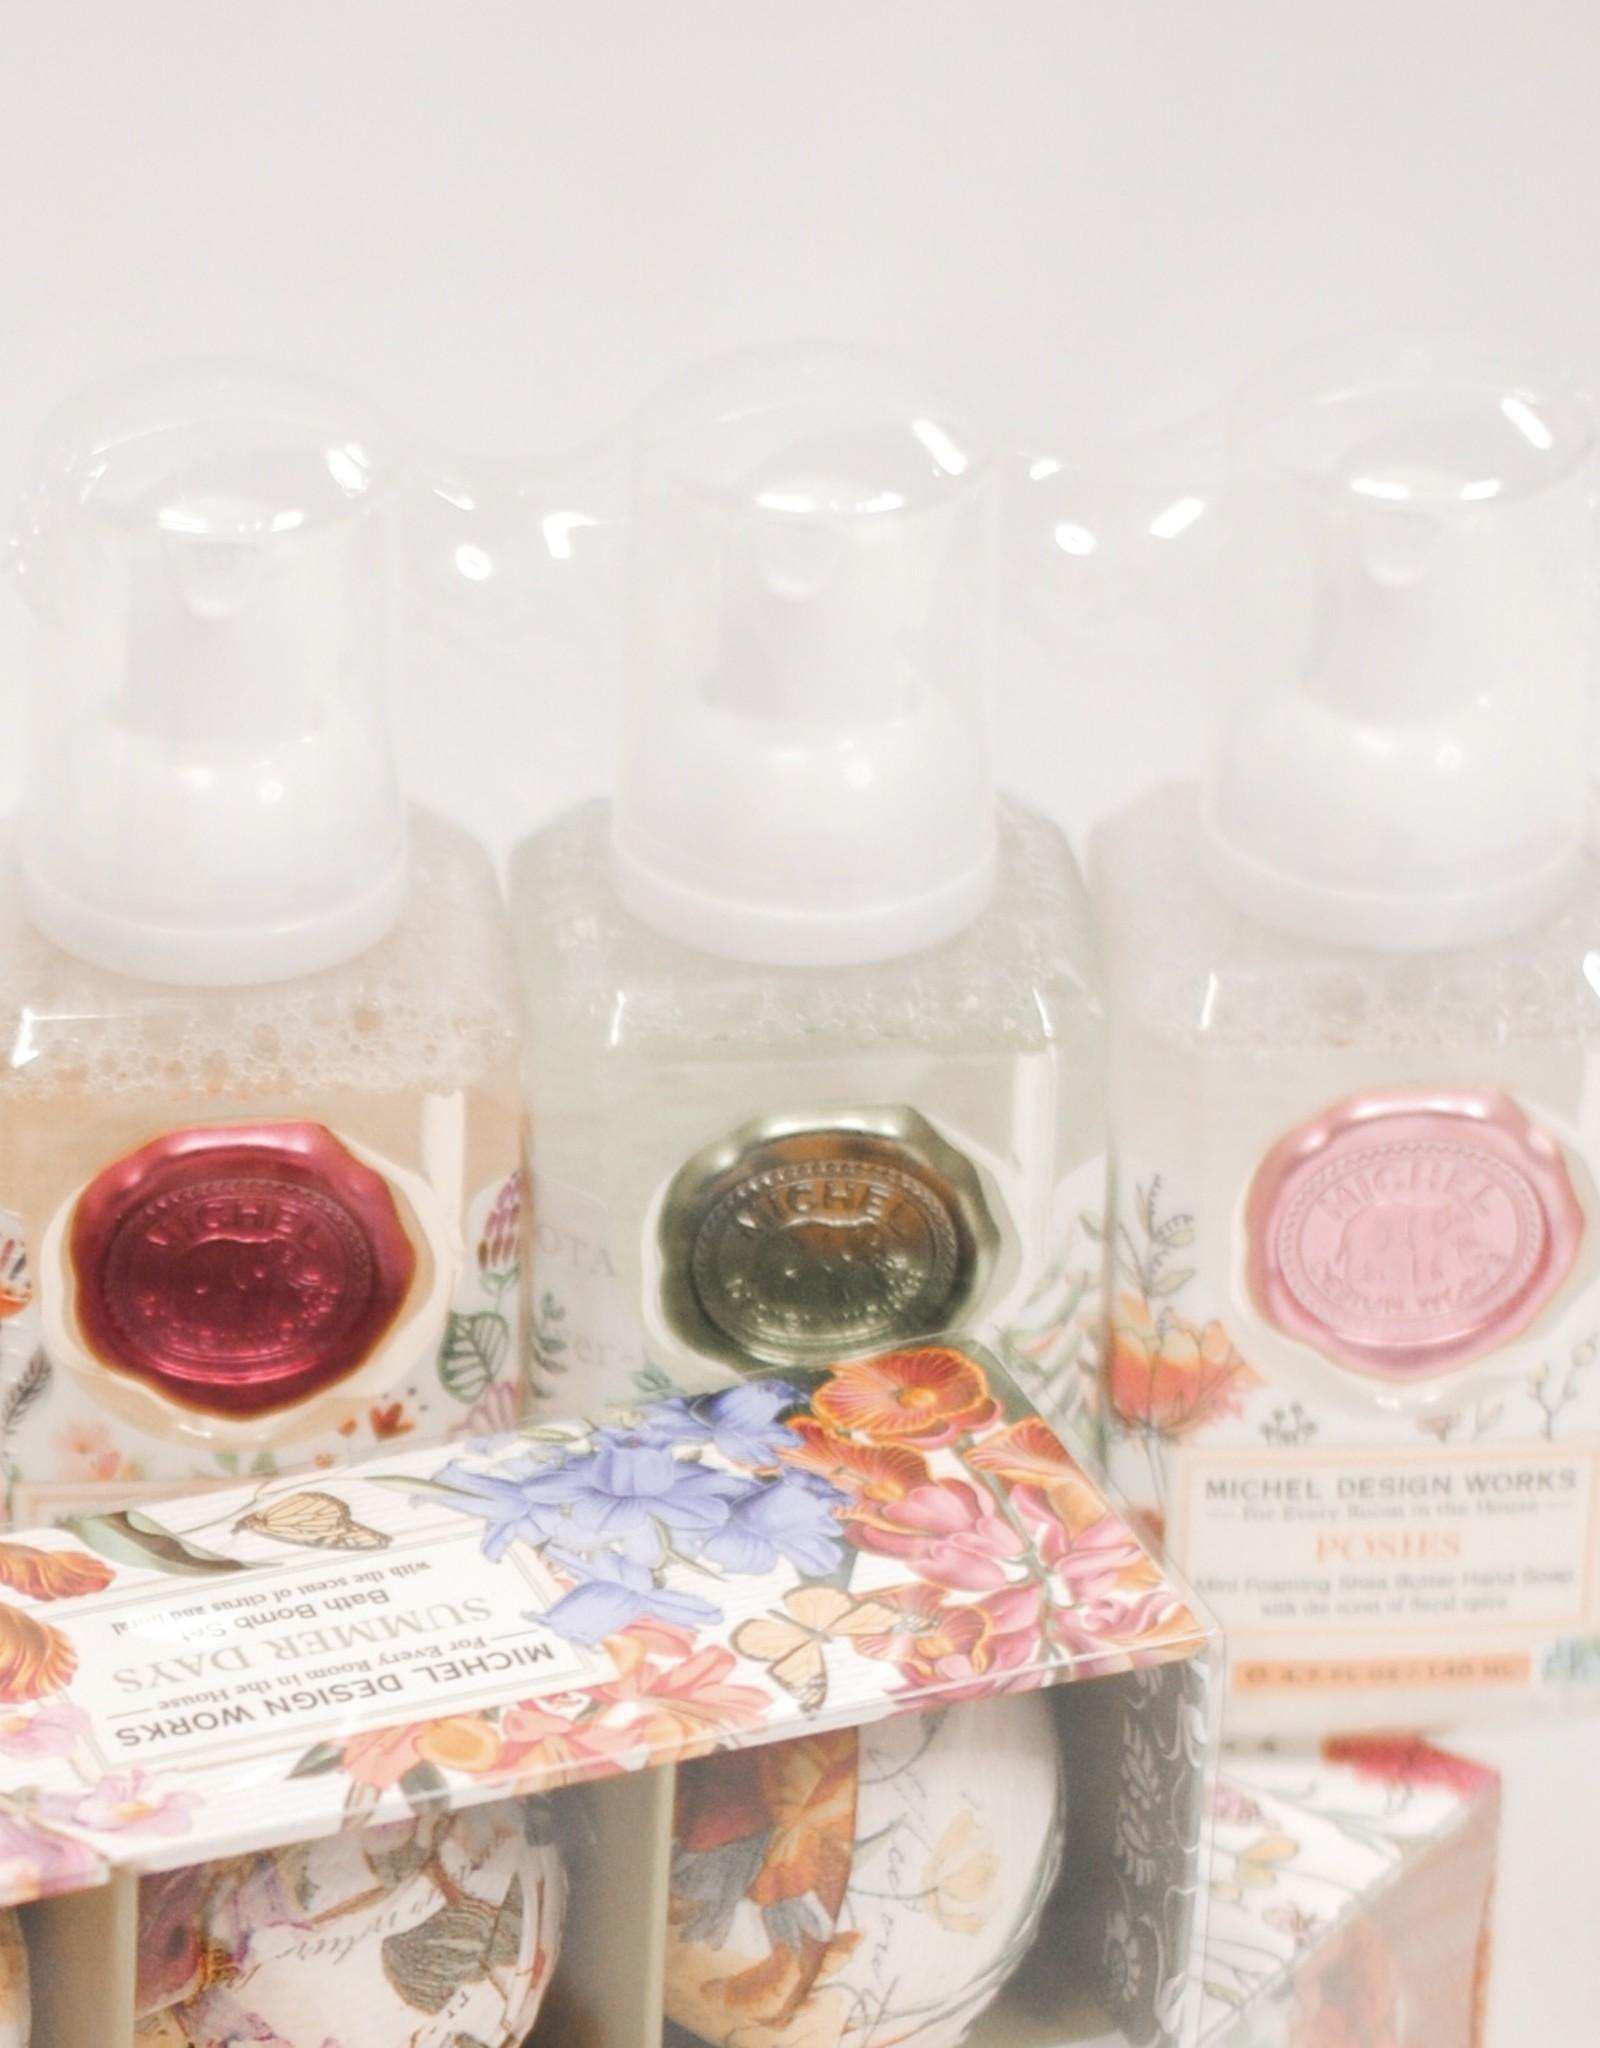 Michel Design Works Mini Foaming Soap Set